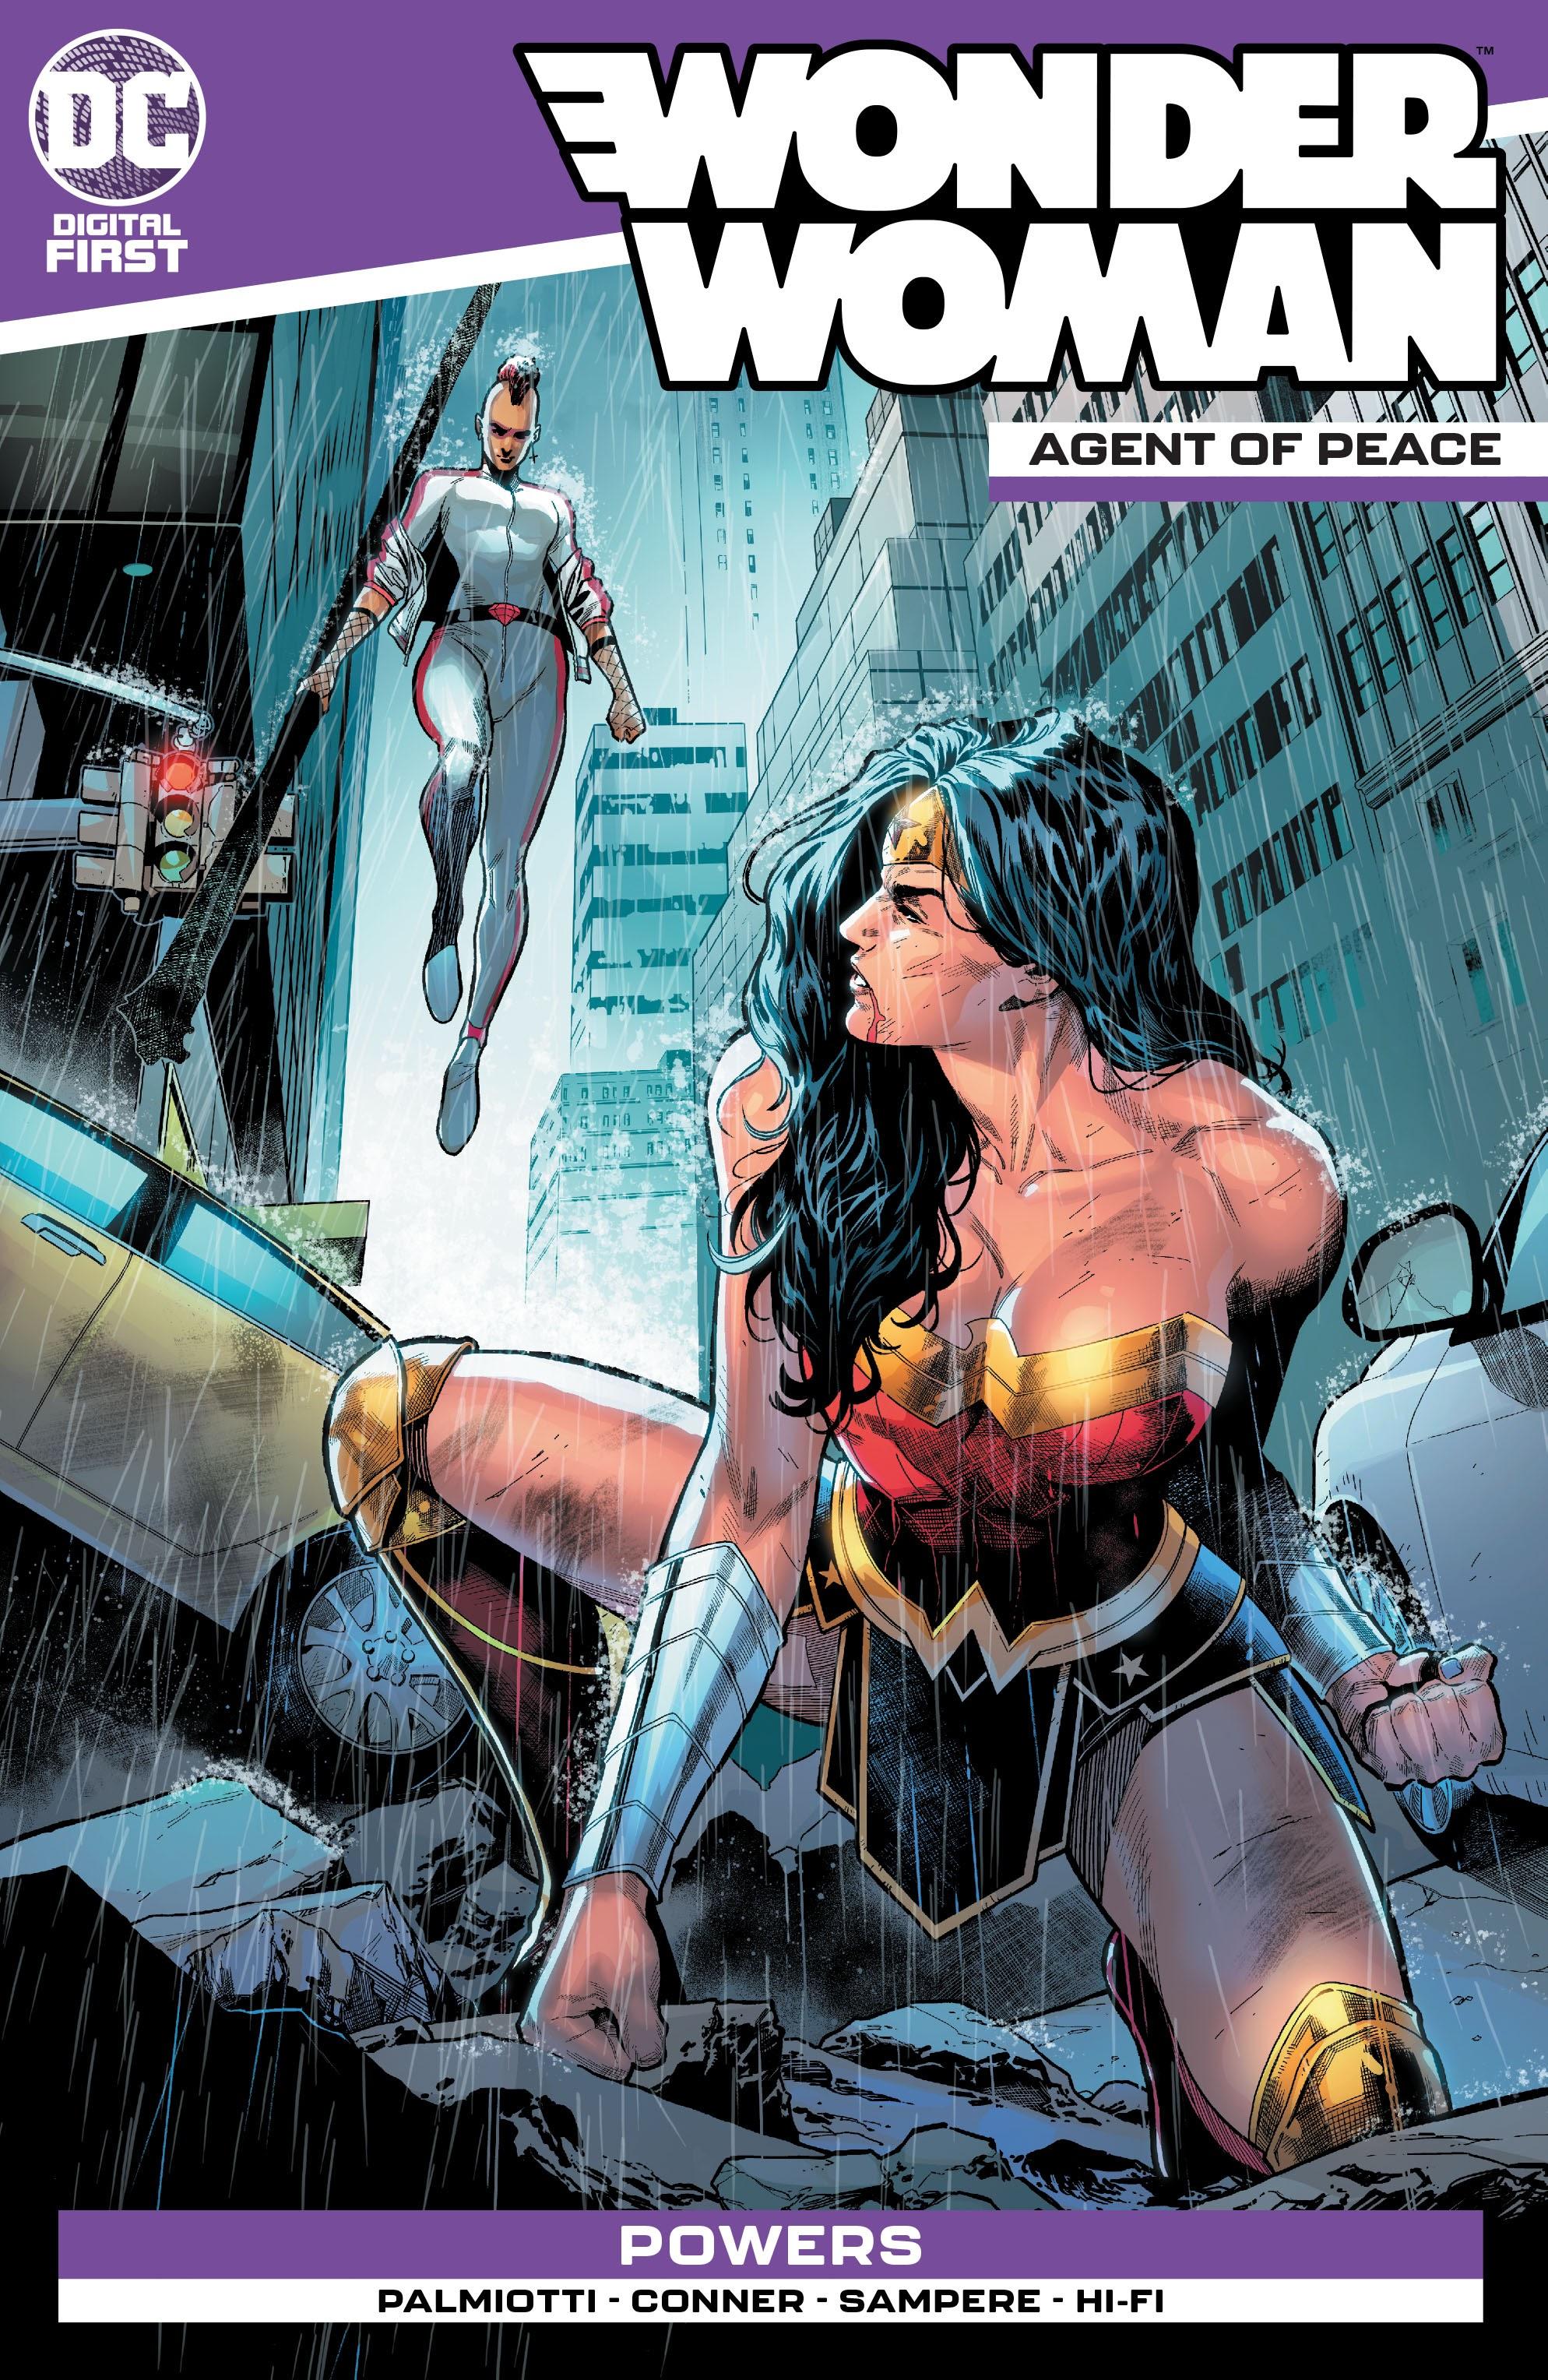 Wonder Woman: Agent of Peace Vol 1 11 (Digital)